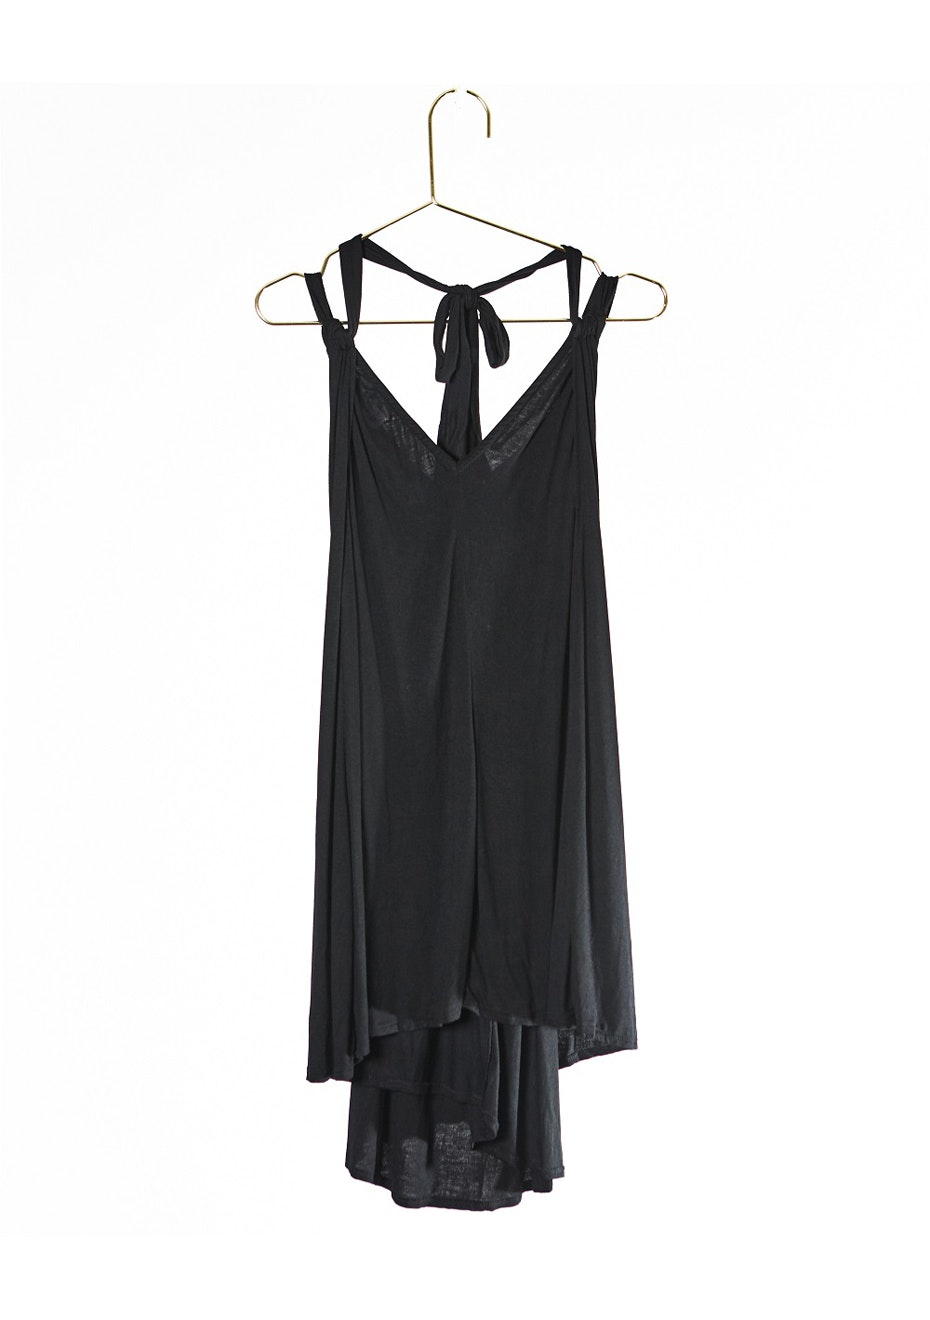 WRAP N DRAPR DRESS - BLACK